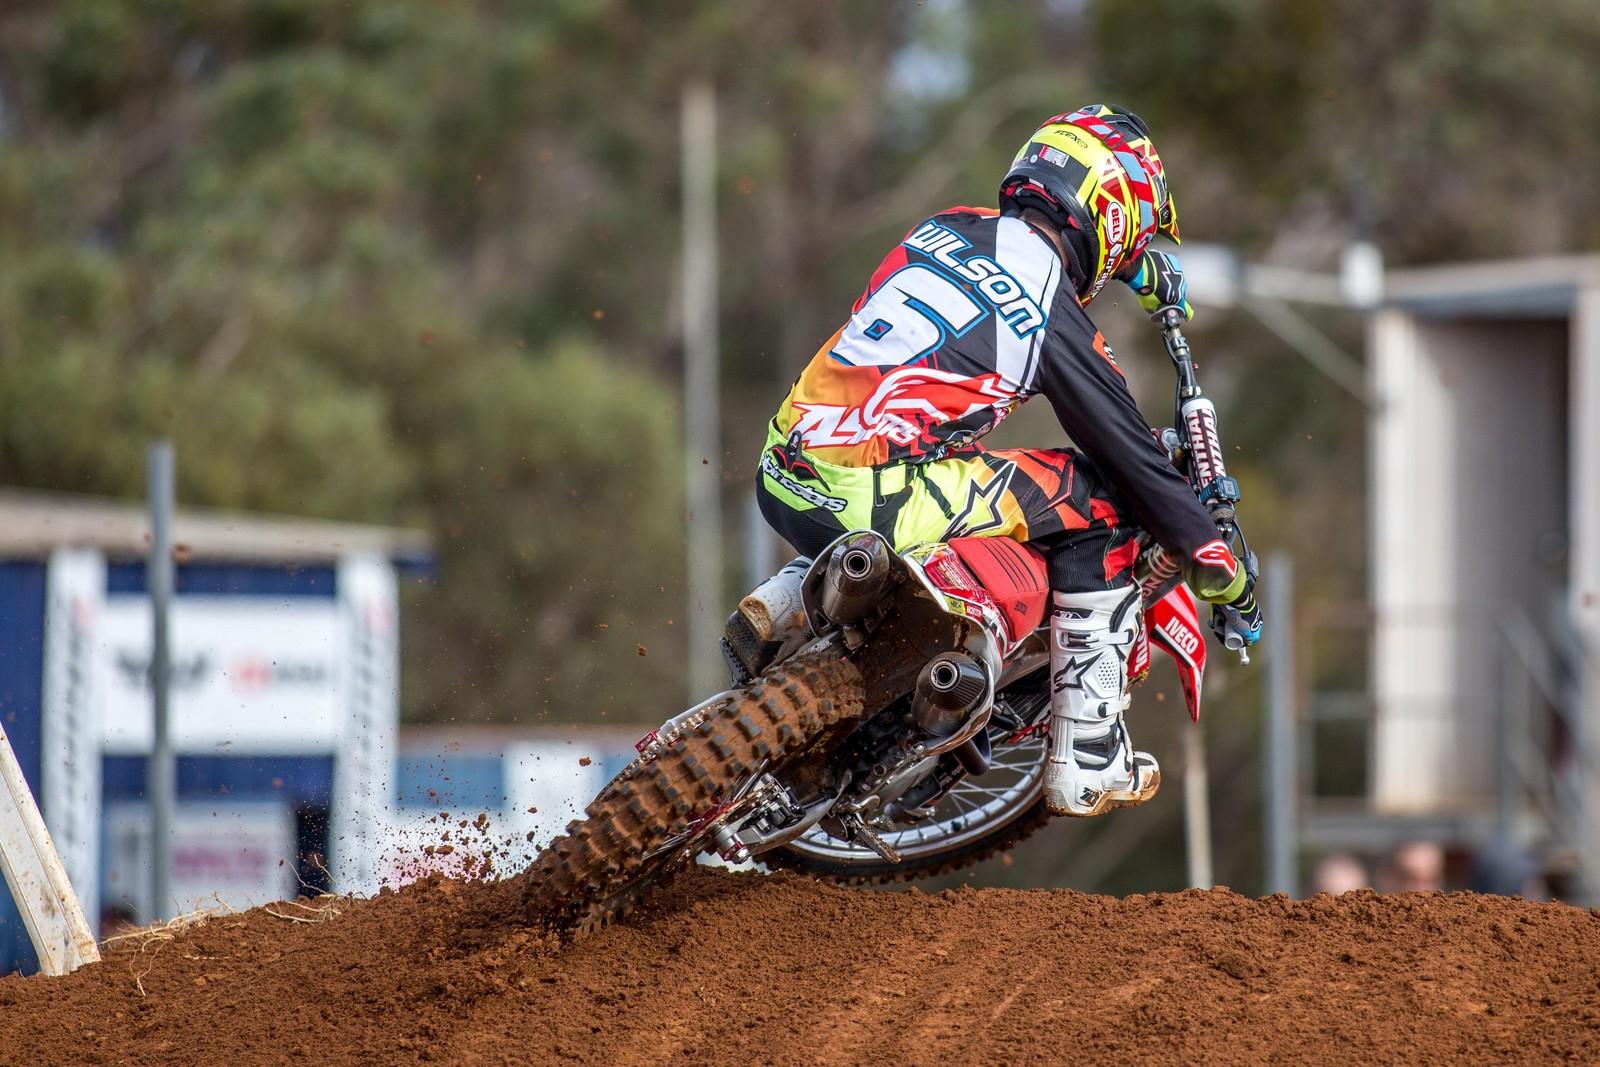 Jay Wilson - Australian Motul Mx Championships: Round 4, Murray Bridge - Motocross Pictures - Vital MX